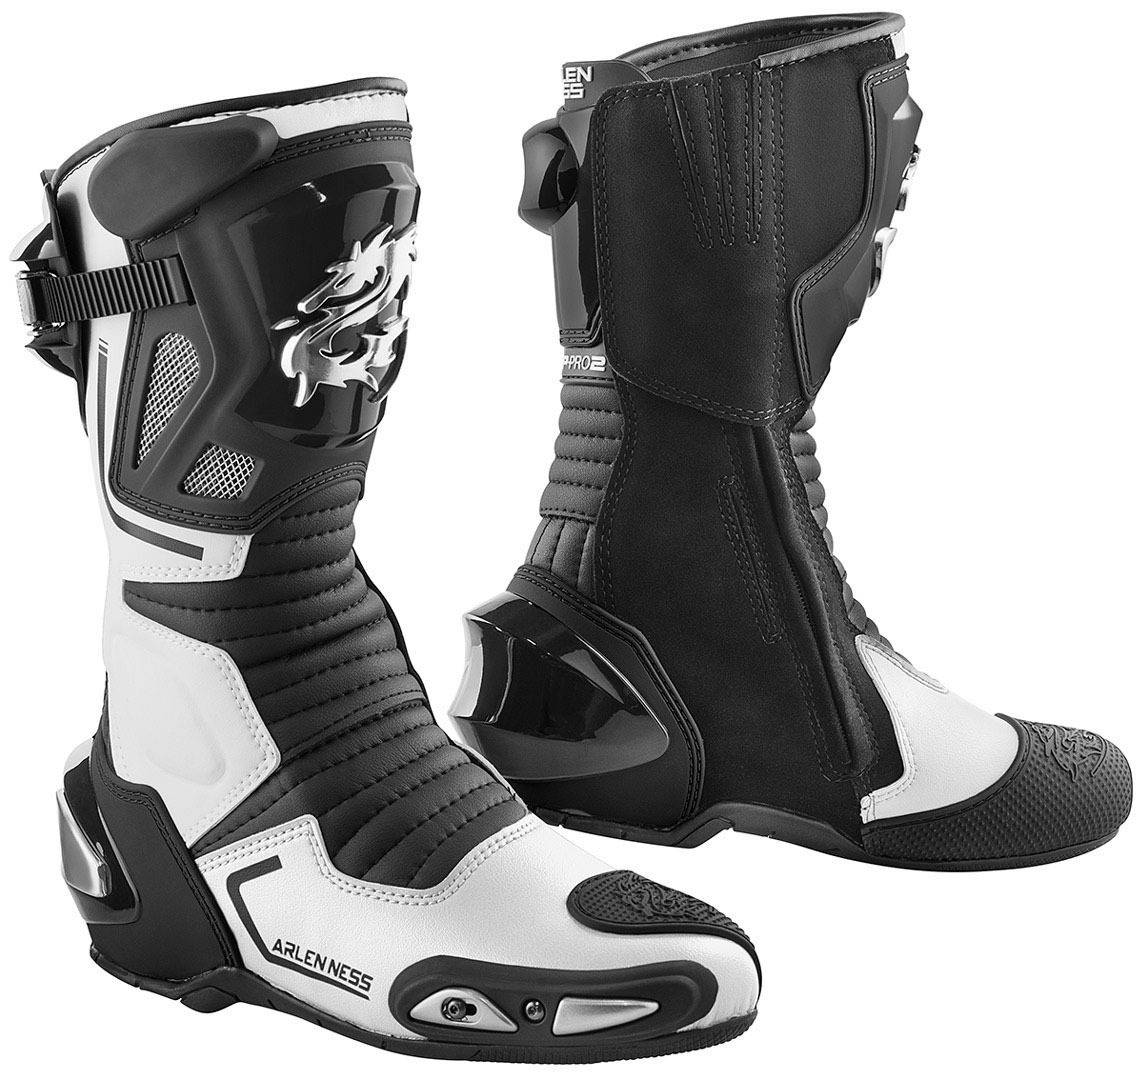 Arlen Ness Sugello Bottes de moto Noir Blanc taille : 43